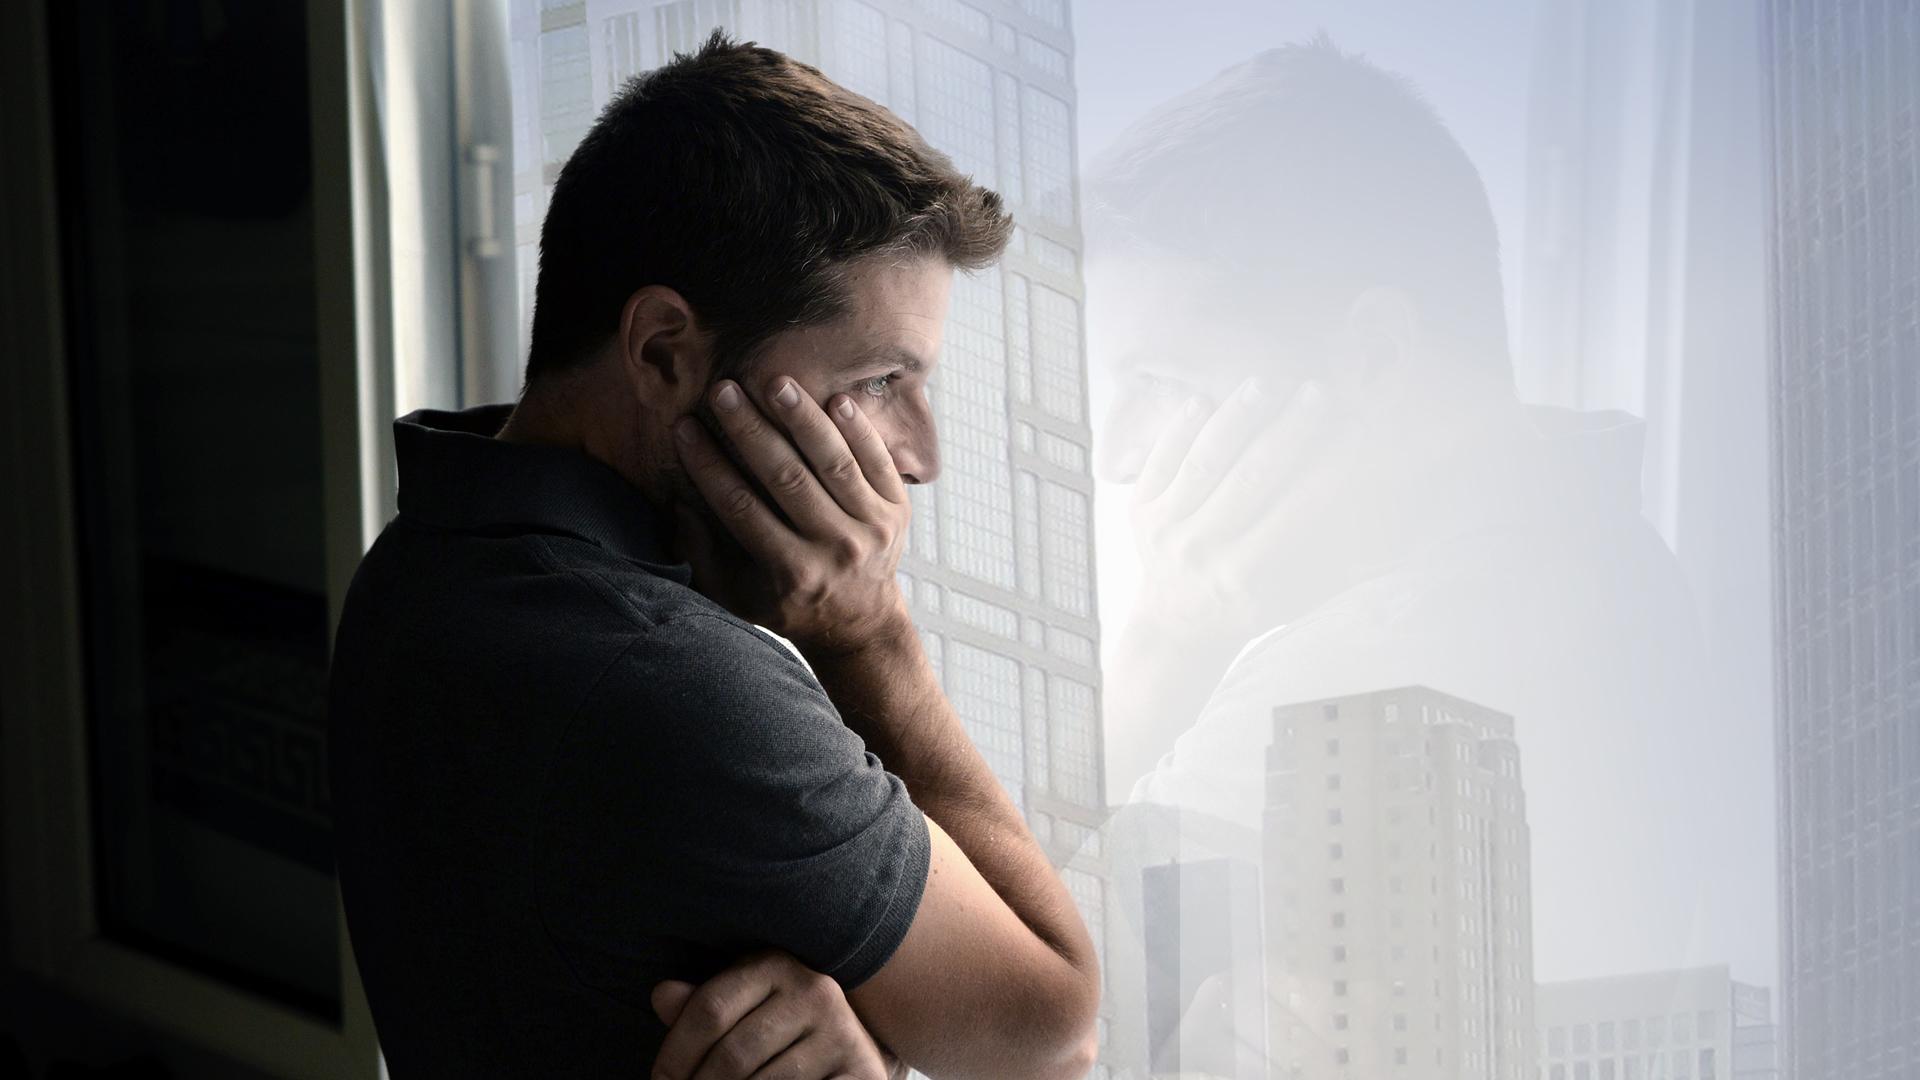 1-15-ch-sad-man-looking-out-window.jpg